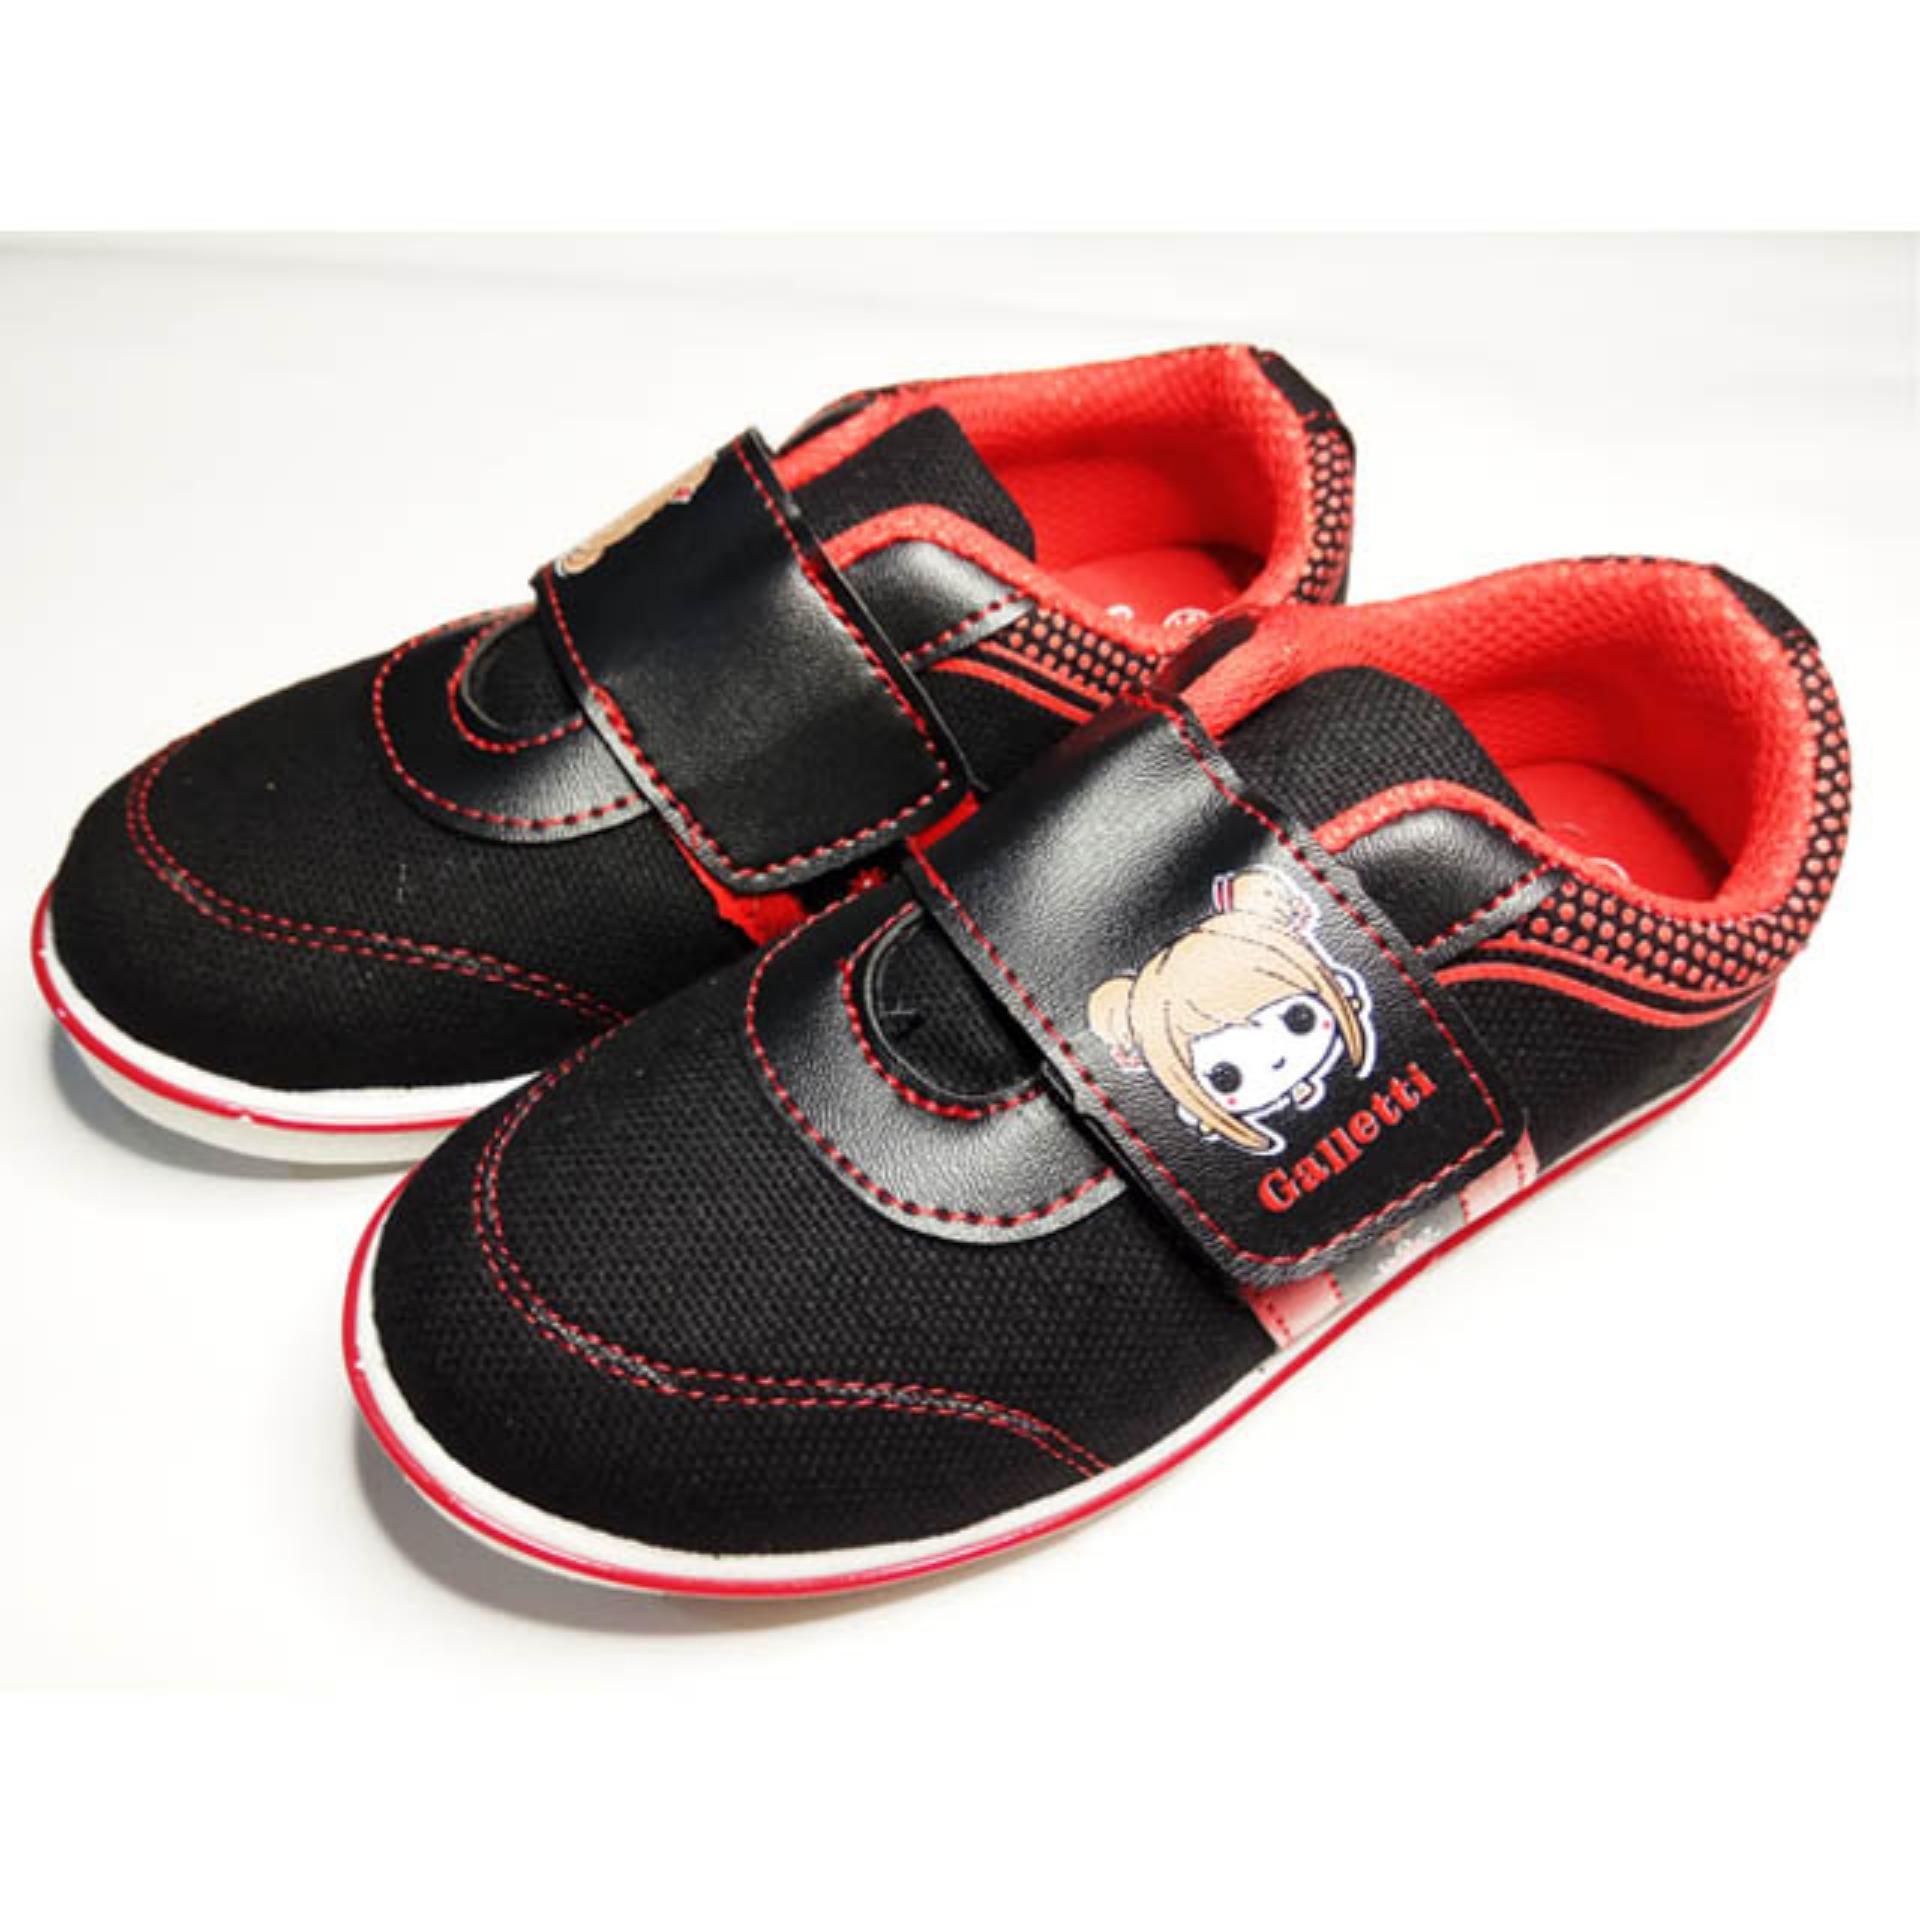 Fanie Shoes - Galletti Gipao 27-34 / Fashion Anak / Sepatu Sekolah Anak Perempuan / Sepatu Sekolah Paud / Tk / Sepatu Sekolah Anak Sd / Sepatu Hitam / Sepatu Sekolah / Sepatu Murah By Fanie Shoes.